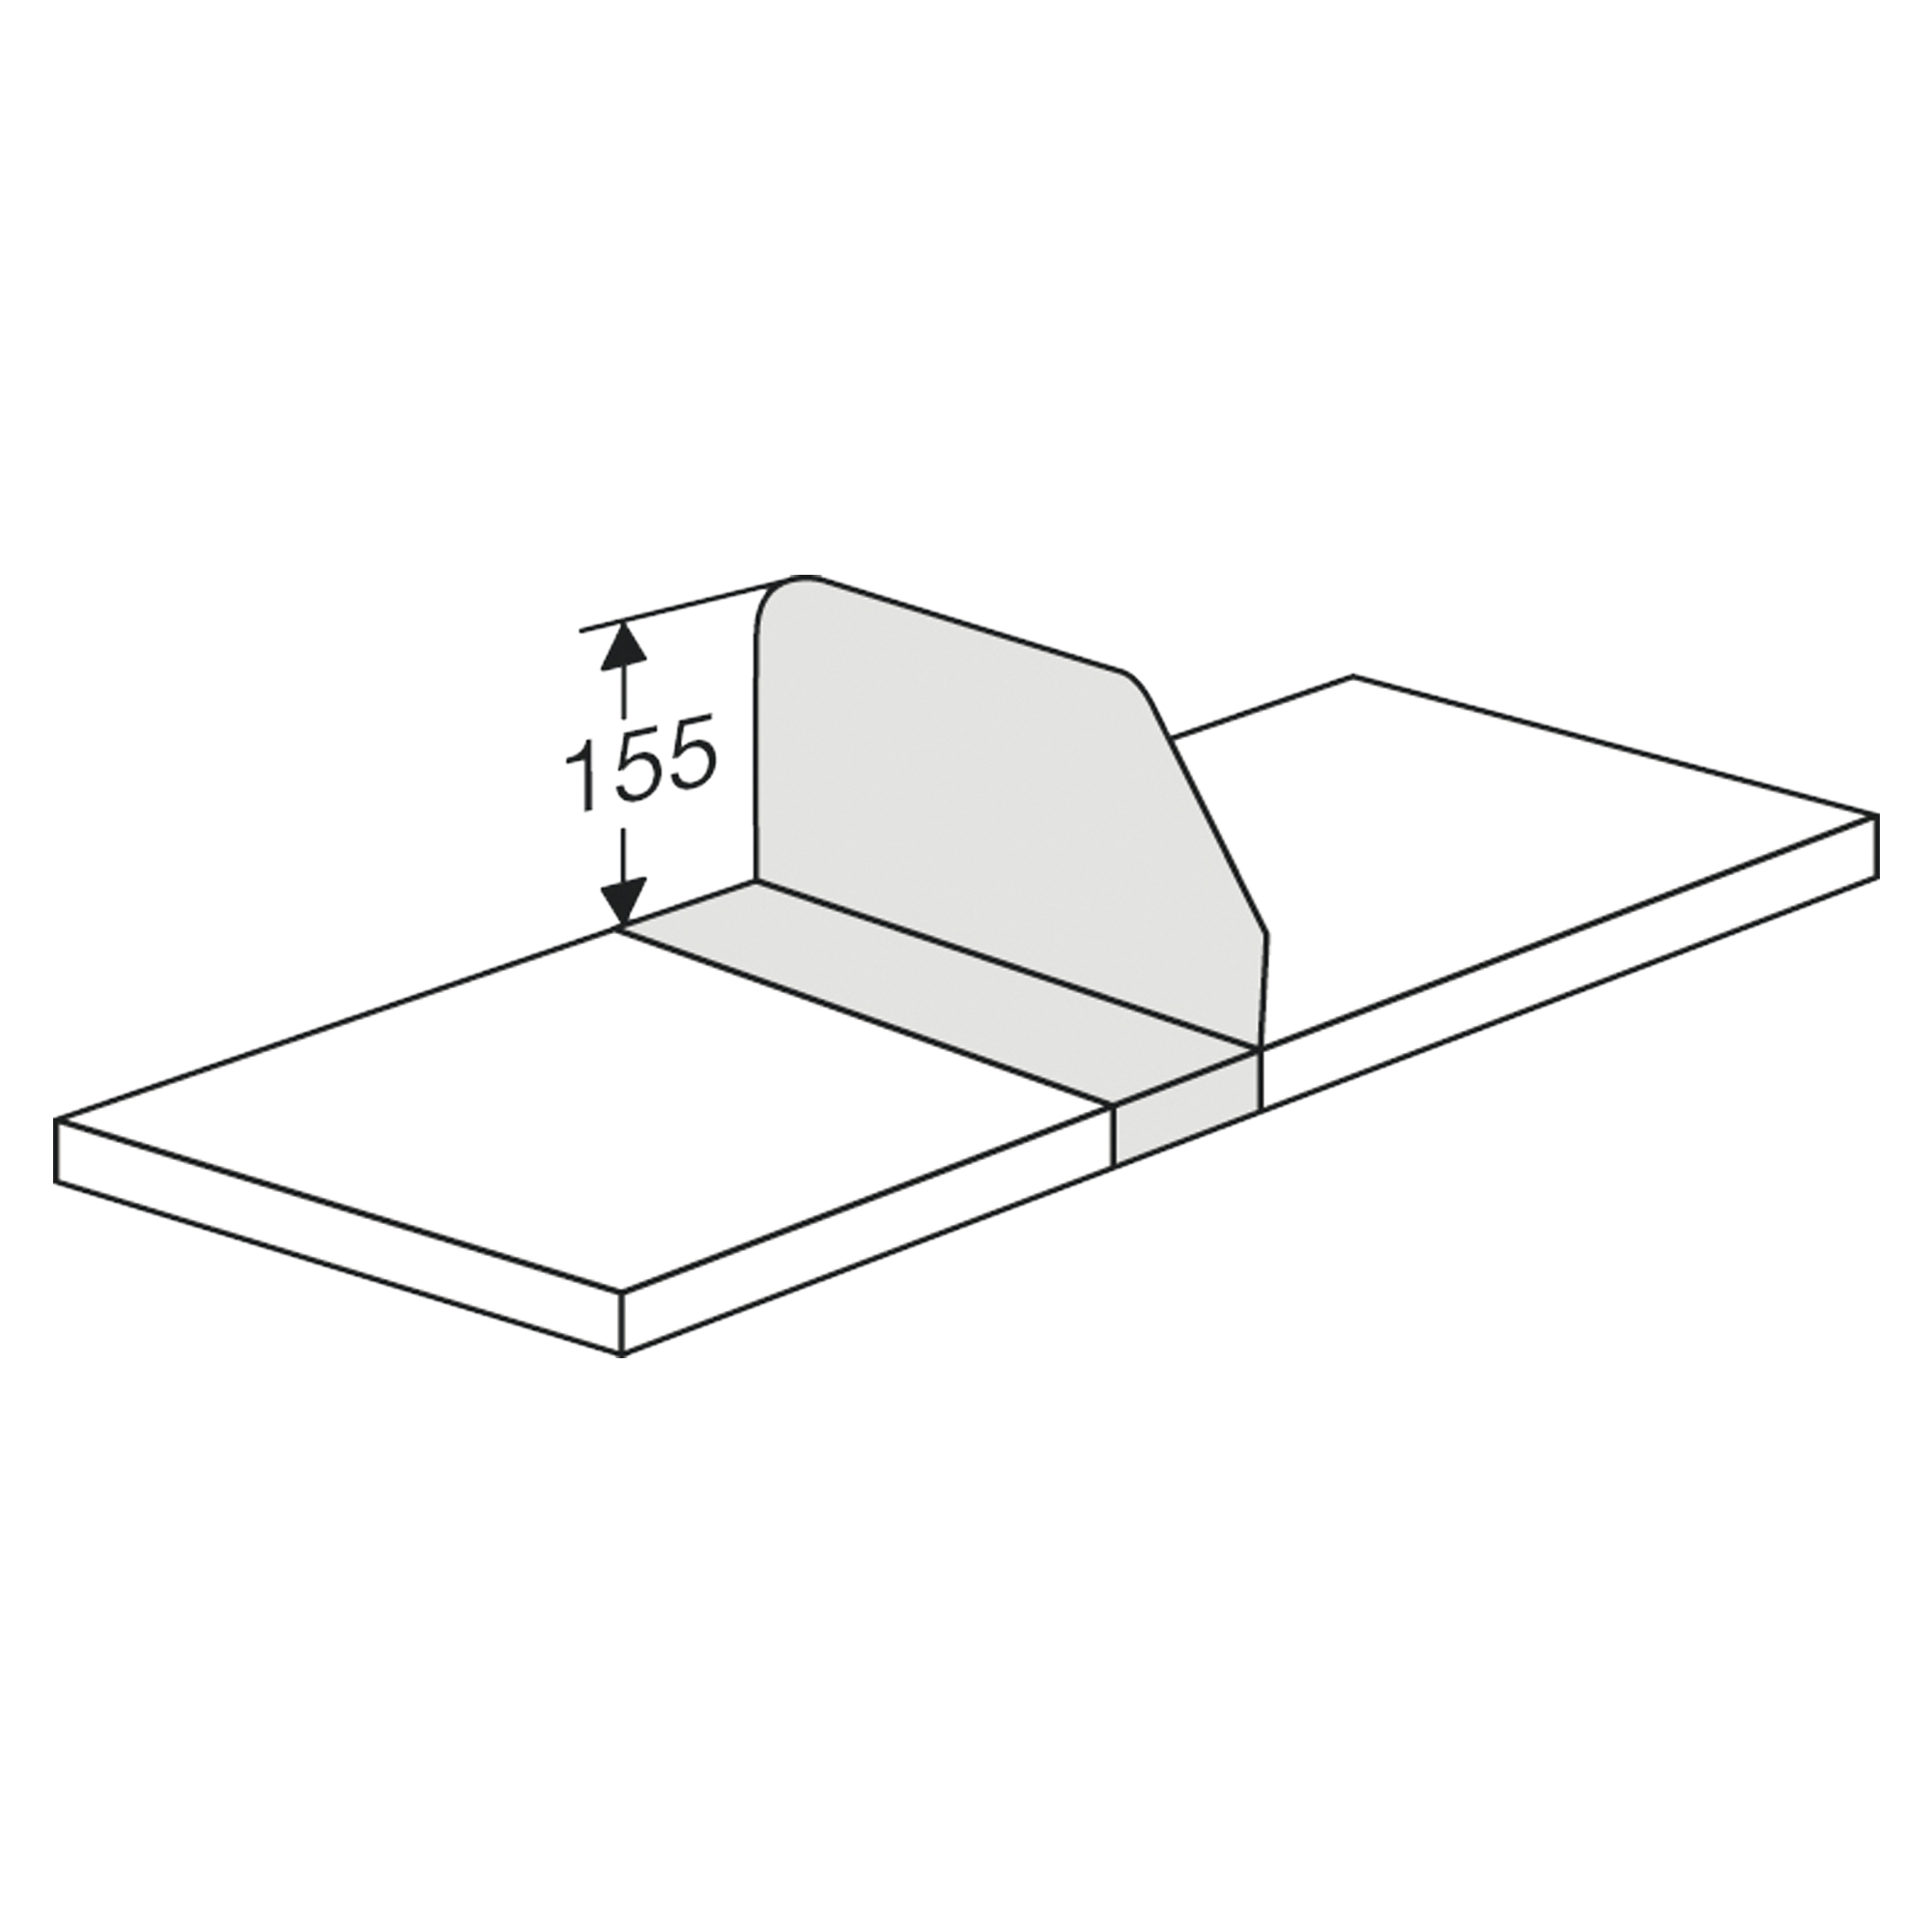 Fachteiler für Komplett-Regal/Klappenregal, 300 mm